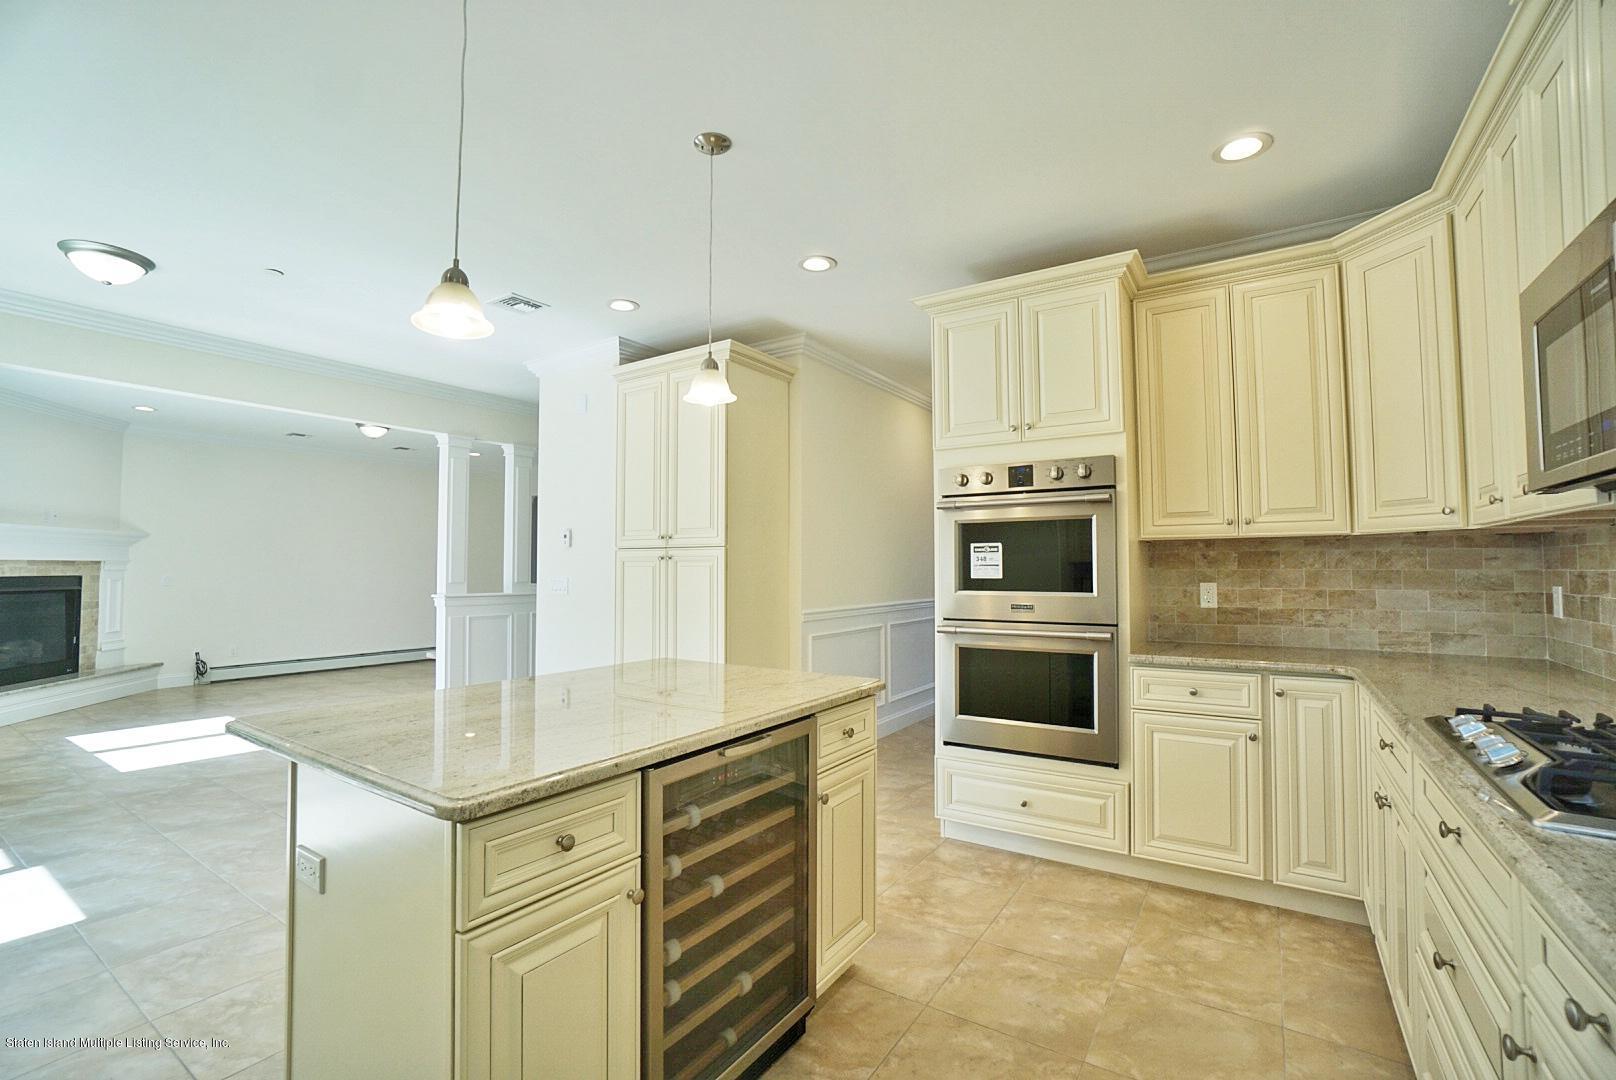 Single Family - Detached 678 Yetman Avenue  Staten Island, NY 10307, MLS-1132766-19